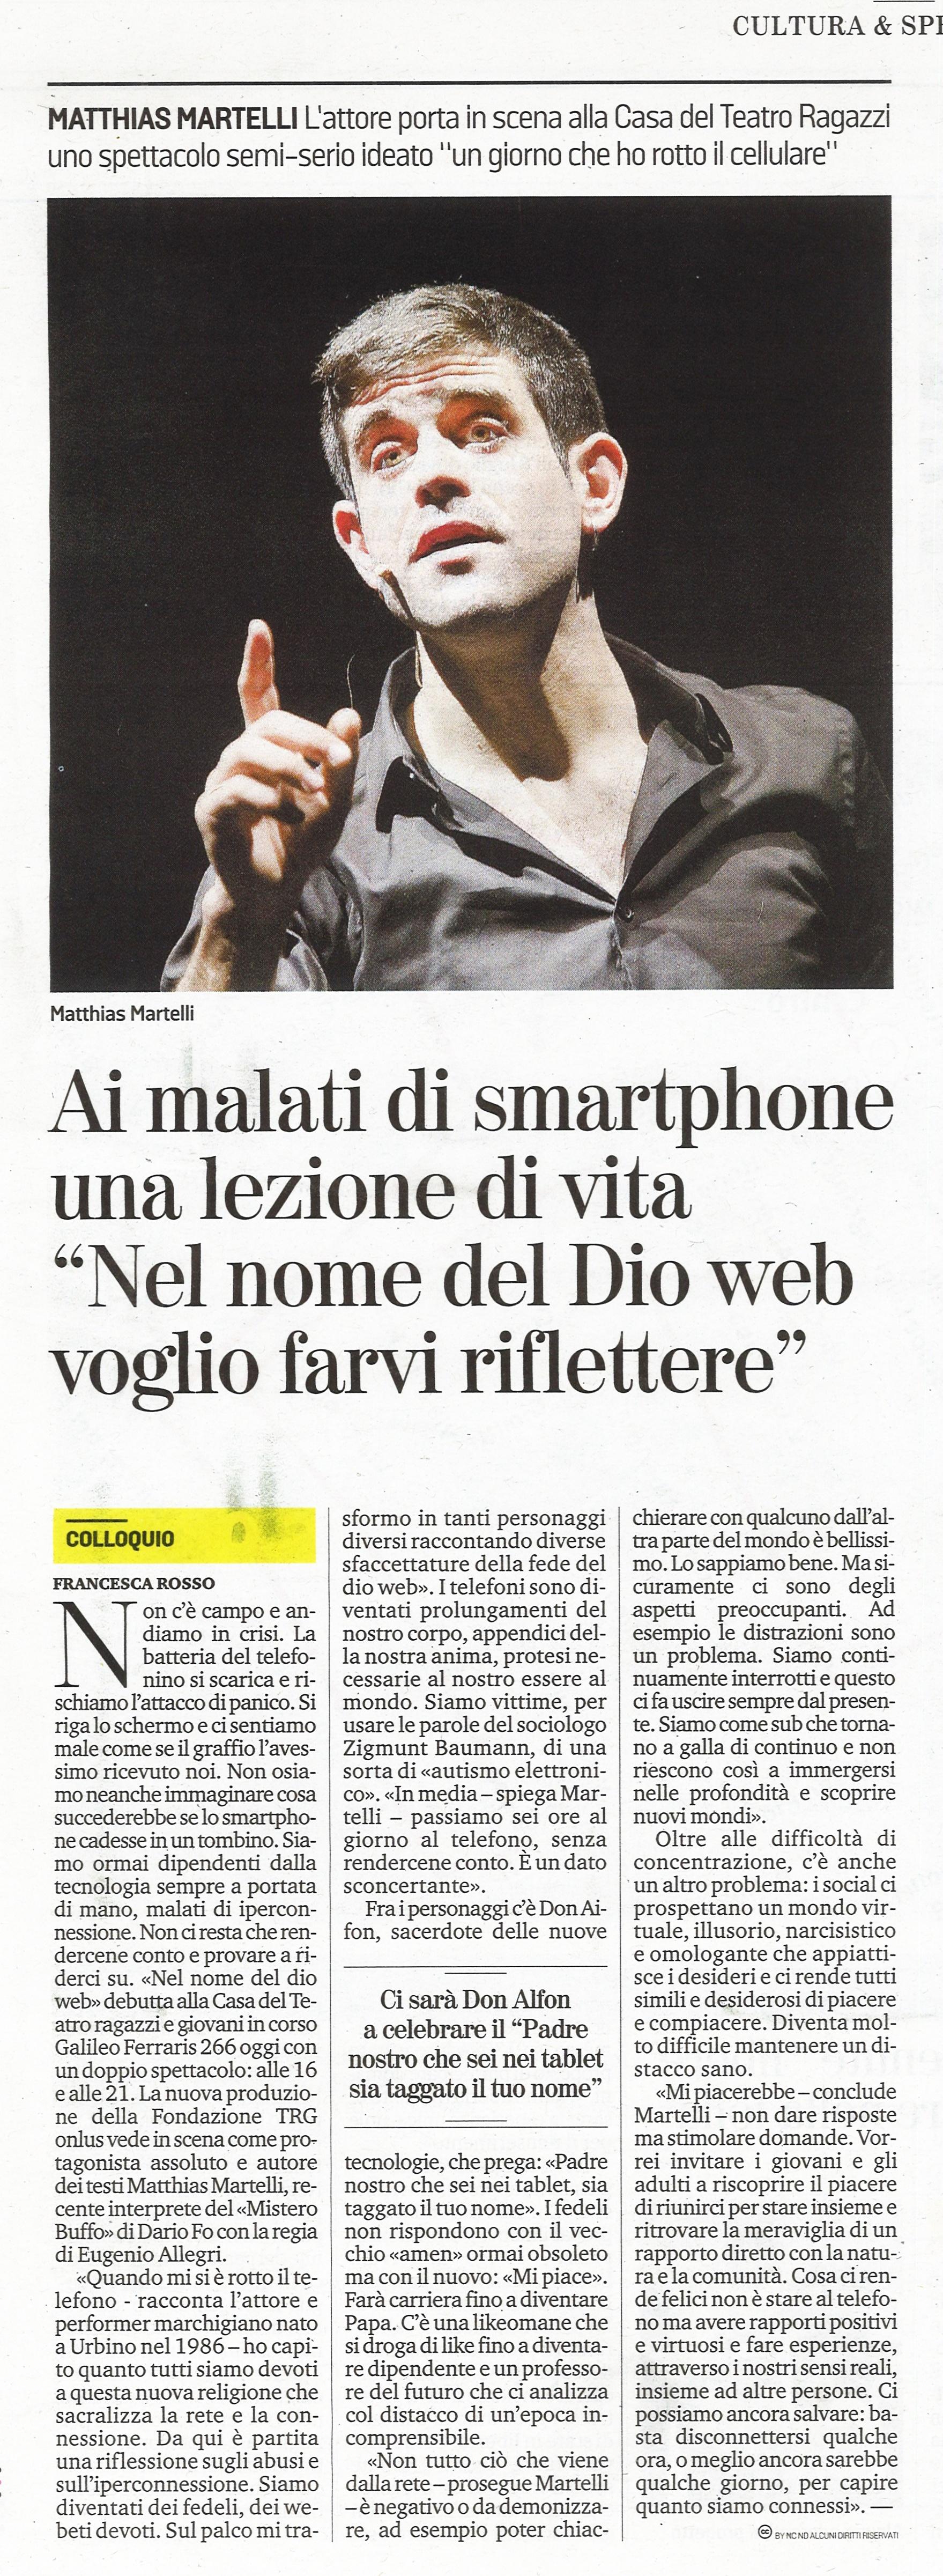 La Stampa, 1-3-2019